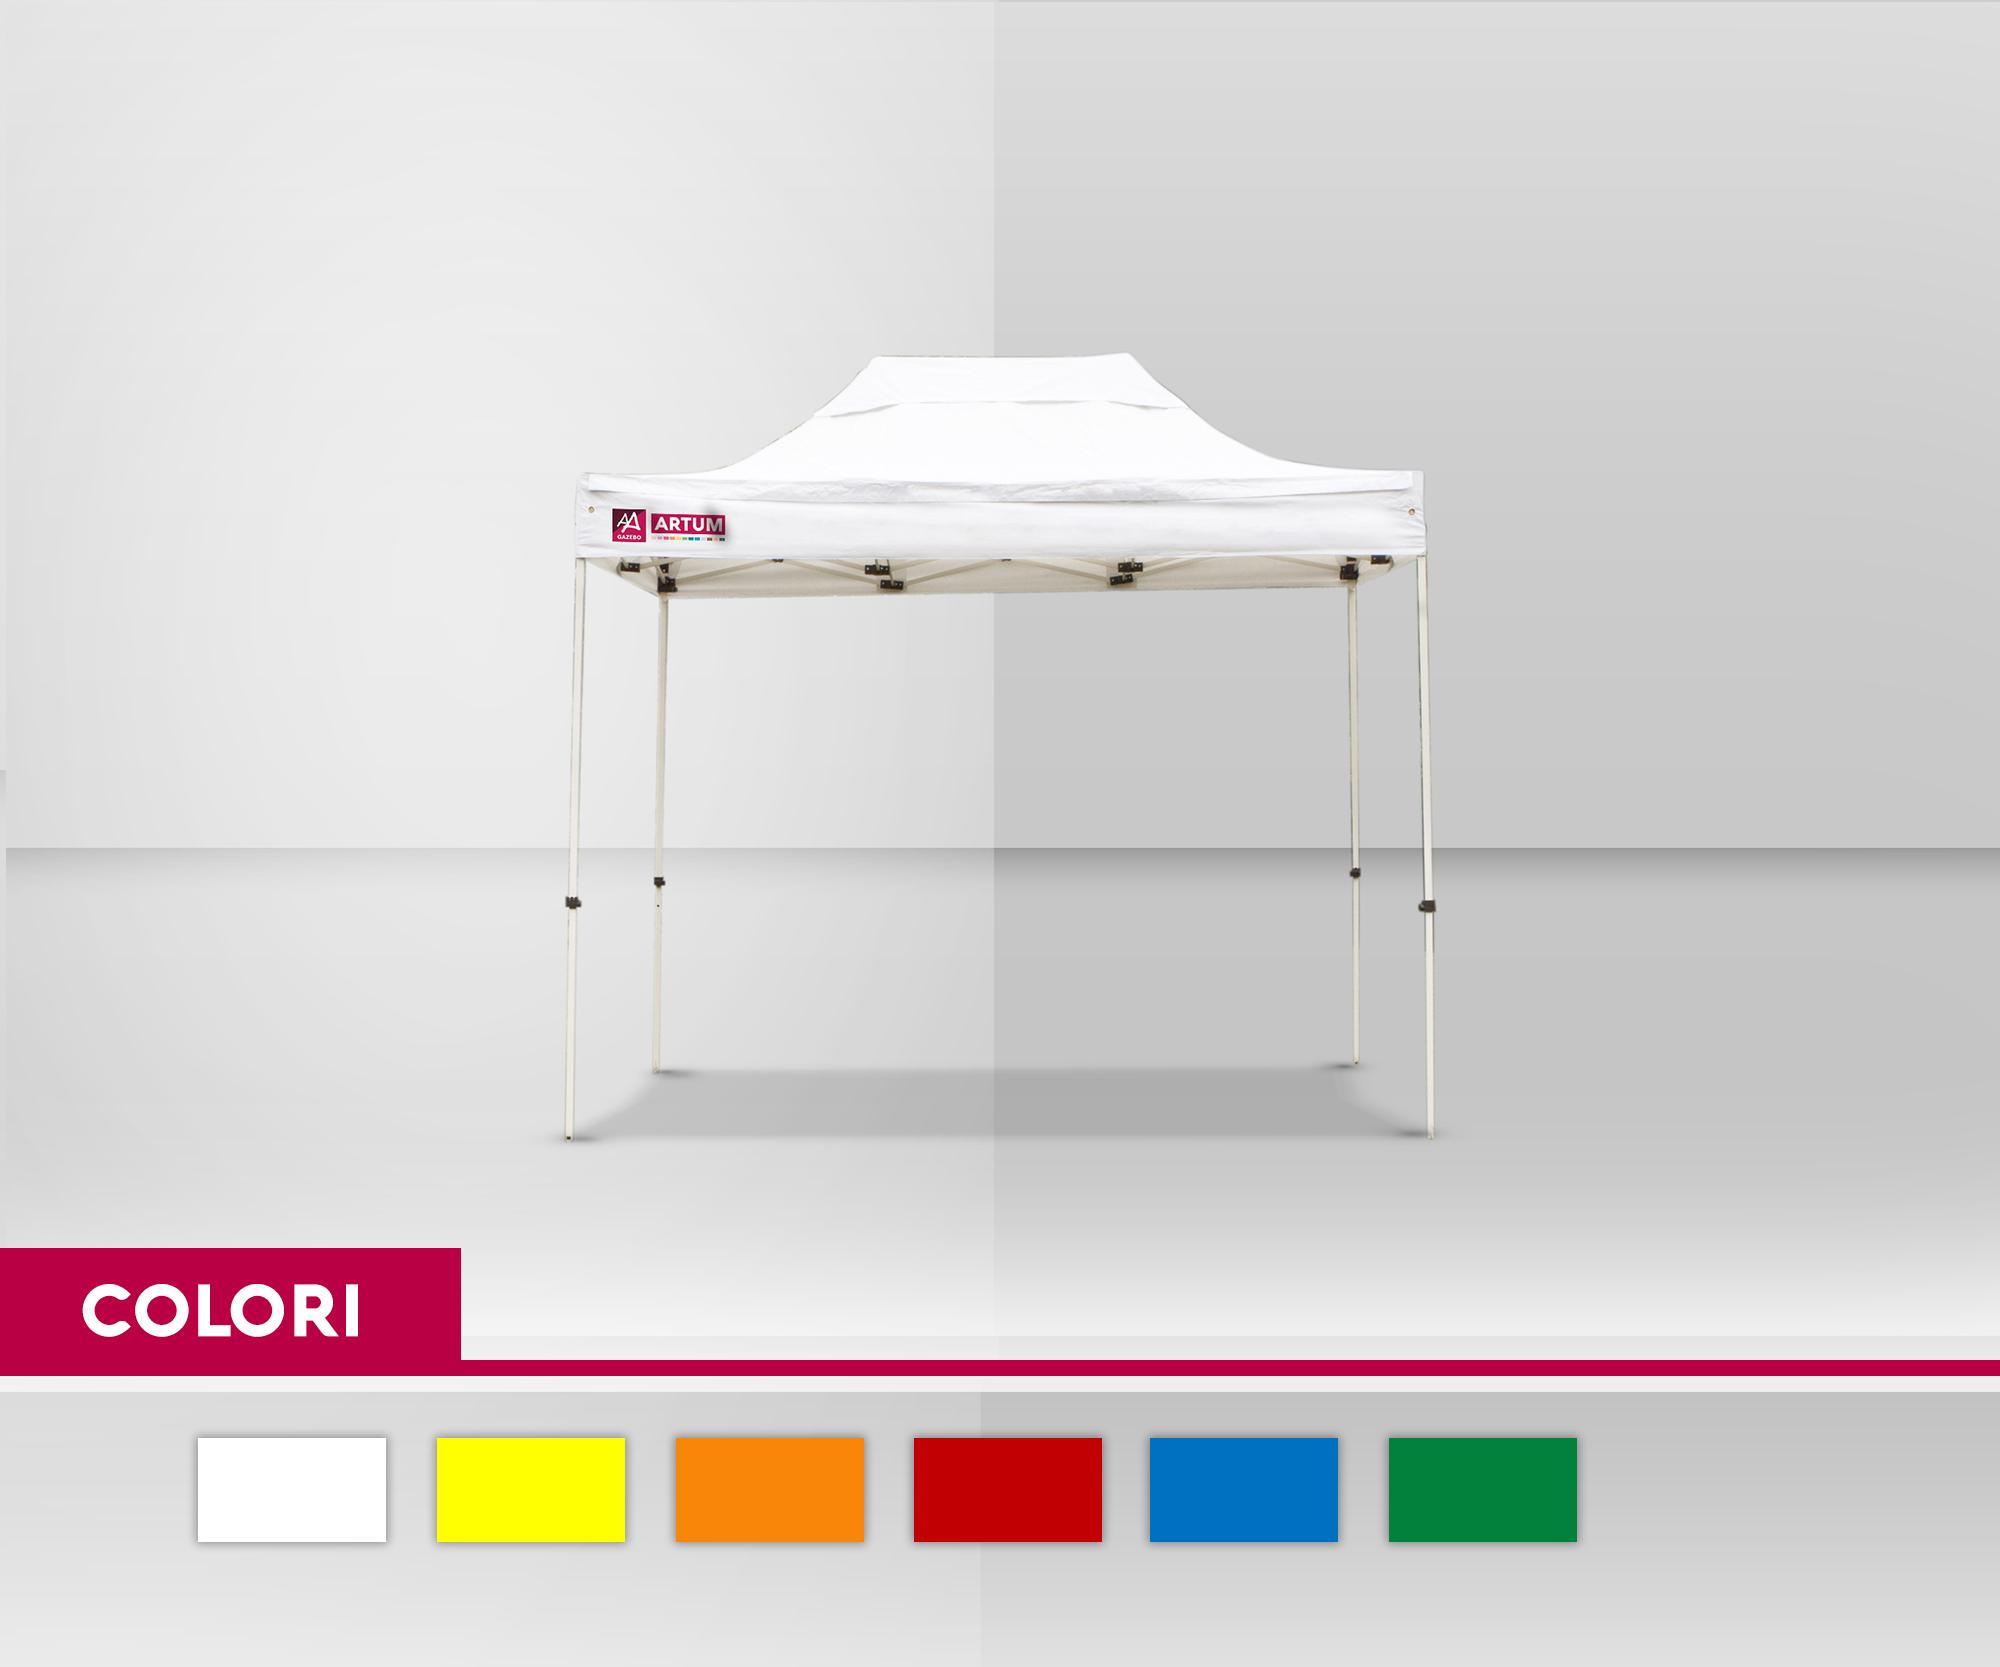 colore-gazebo-3x2-acciaio